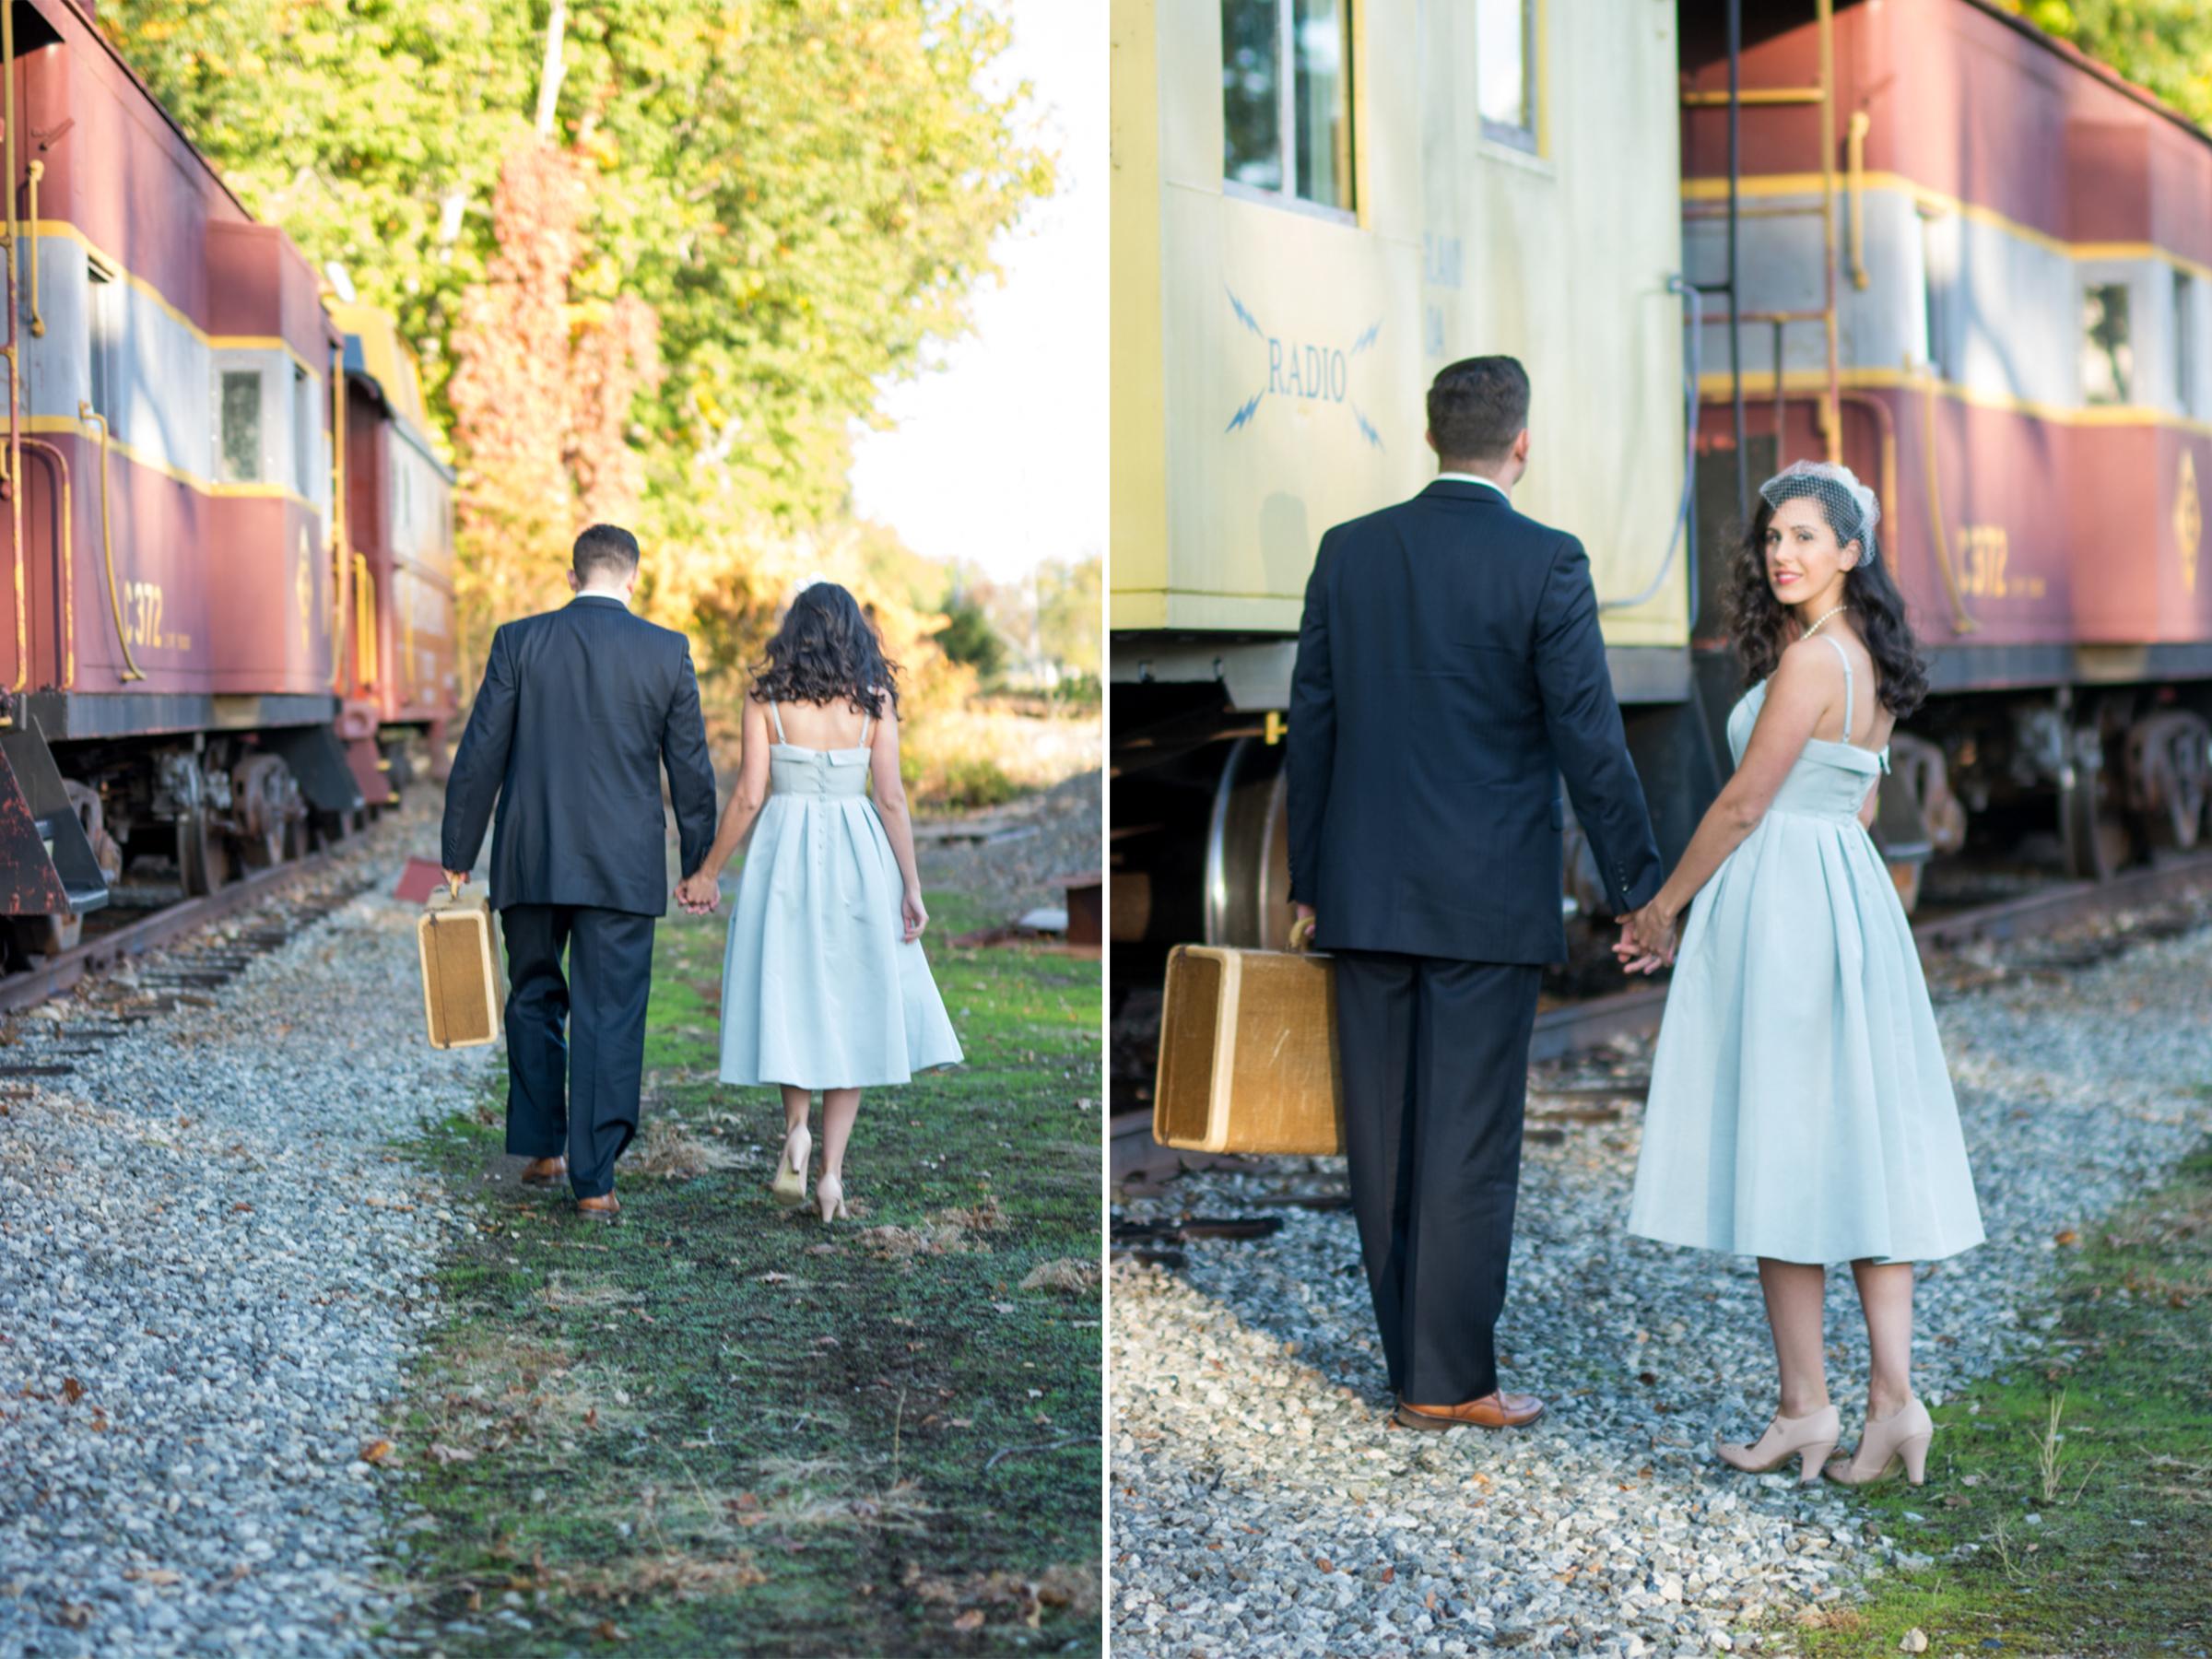 M+J Engagement Photos 5- Whippany Railway Museum- New Jersey -Olivia Christina Photography.jpg